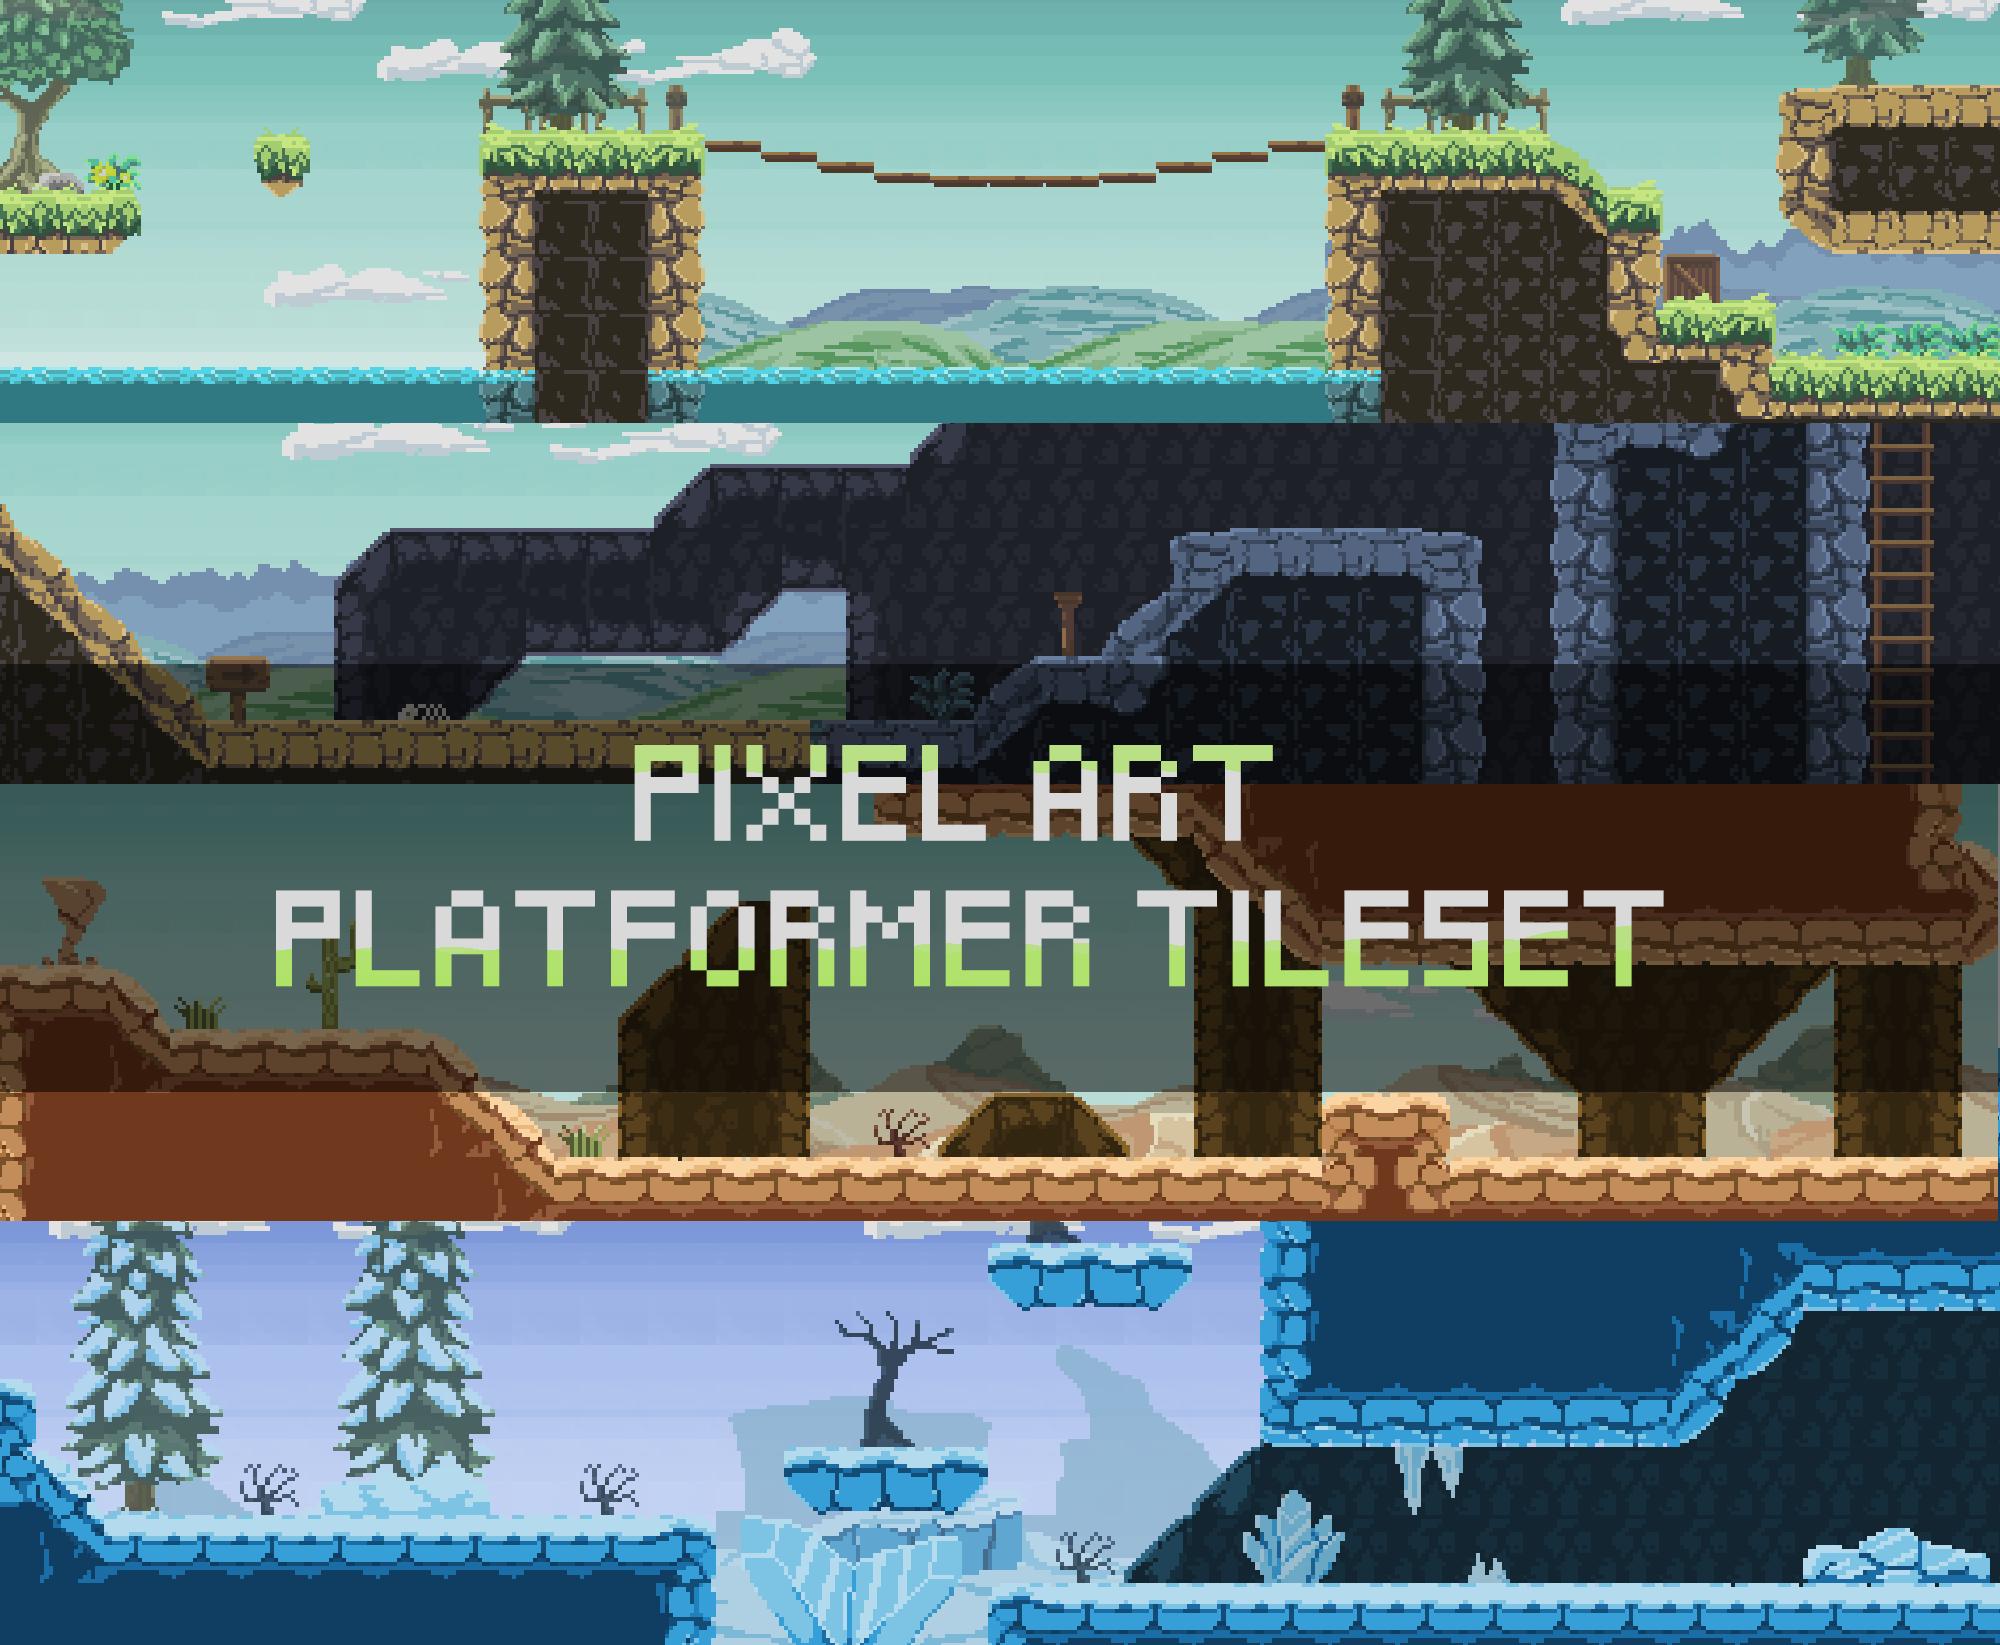 Pixel Art Platformer Tileset